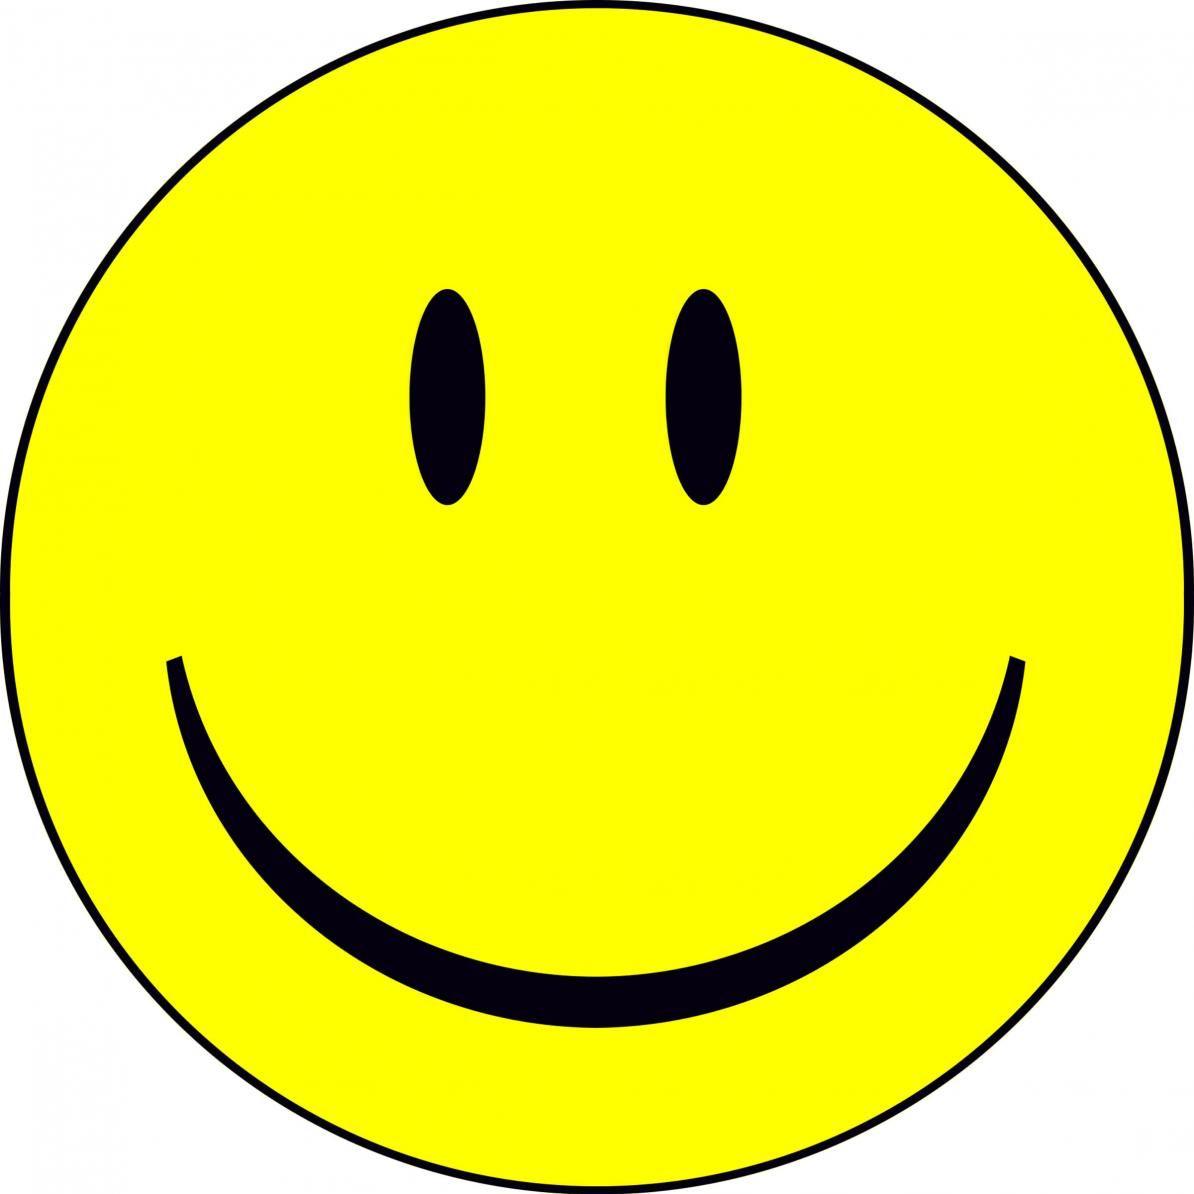 Smiling face clipart svg transparent stock free happy face clip art | Smiley Face Clip Art | Smile Day Site ... svg transparent stock